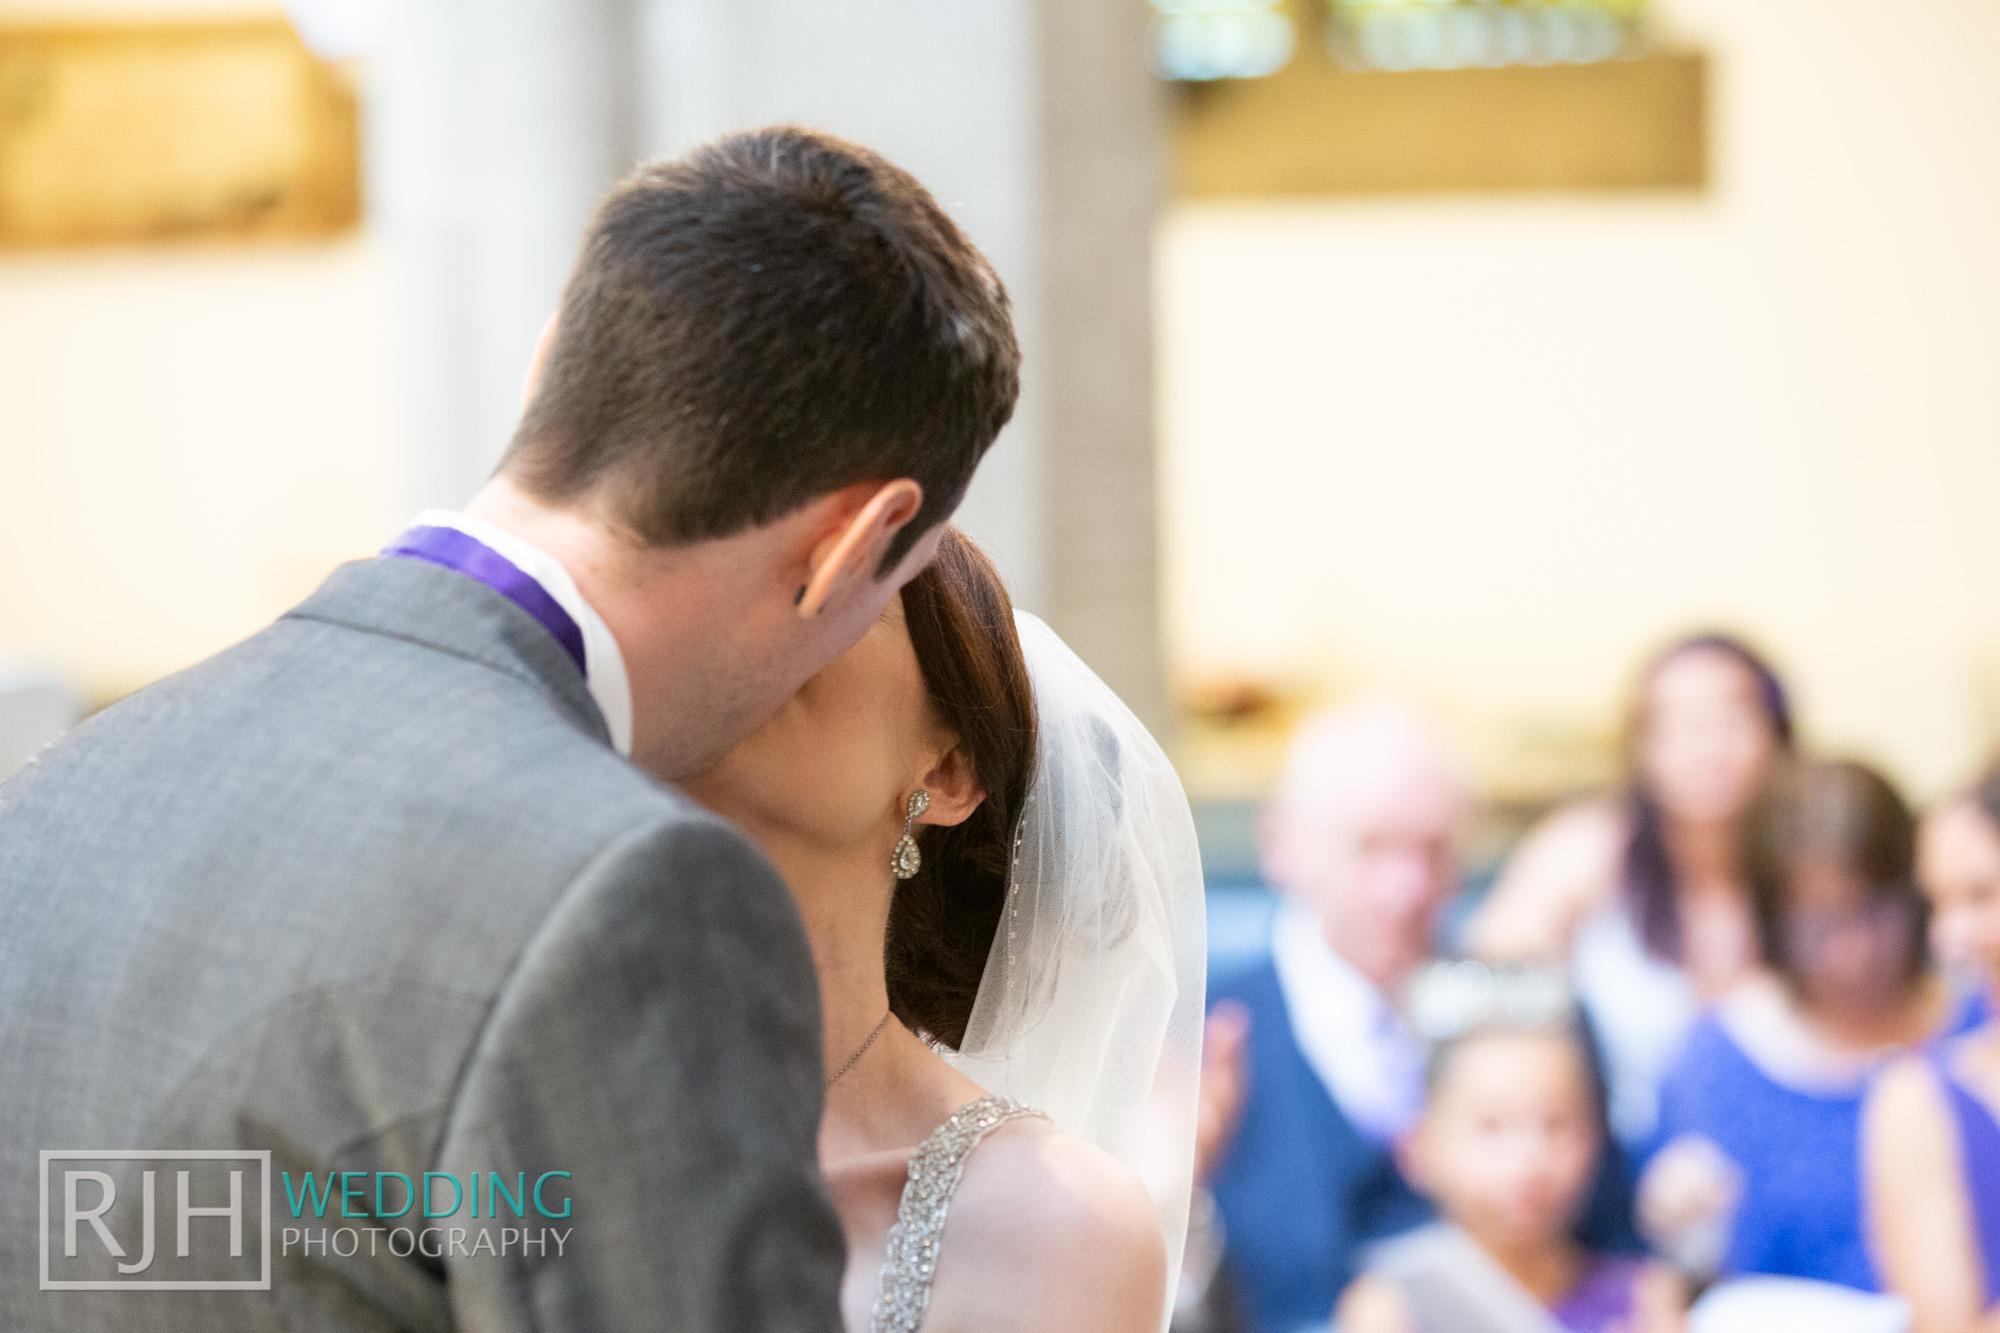 Oulton Hall Wedding Photography_Goodwill-Hall_025_RJH17452.jpg